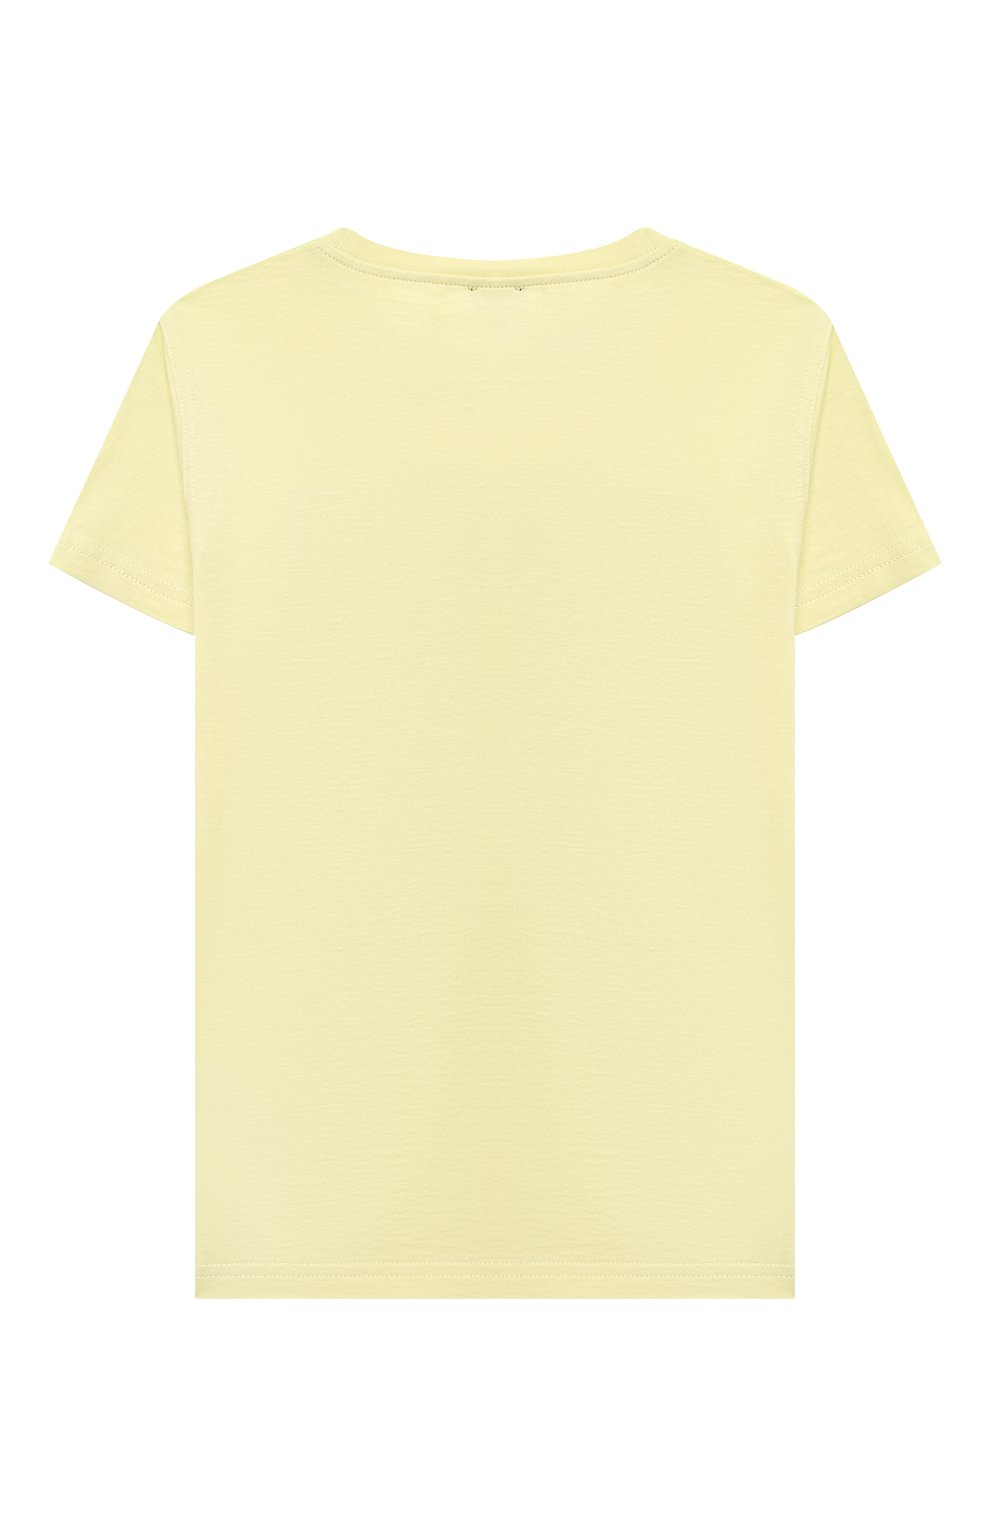 Детская хлопковая футболка IL GUFO желтого цвета, арт. P21TS271M0014/5A-8A | Фото 2